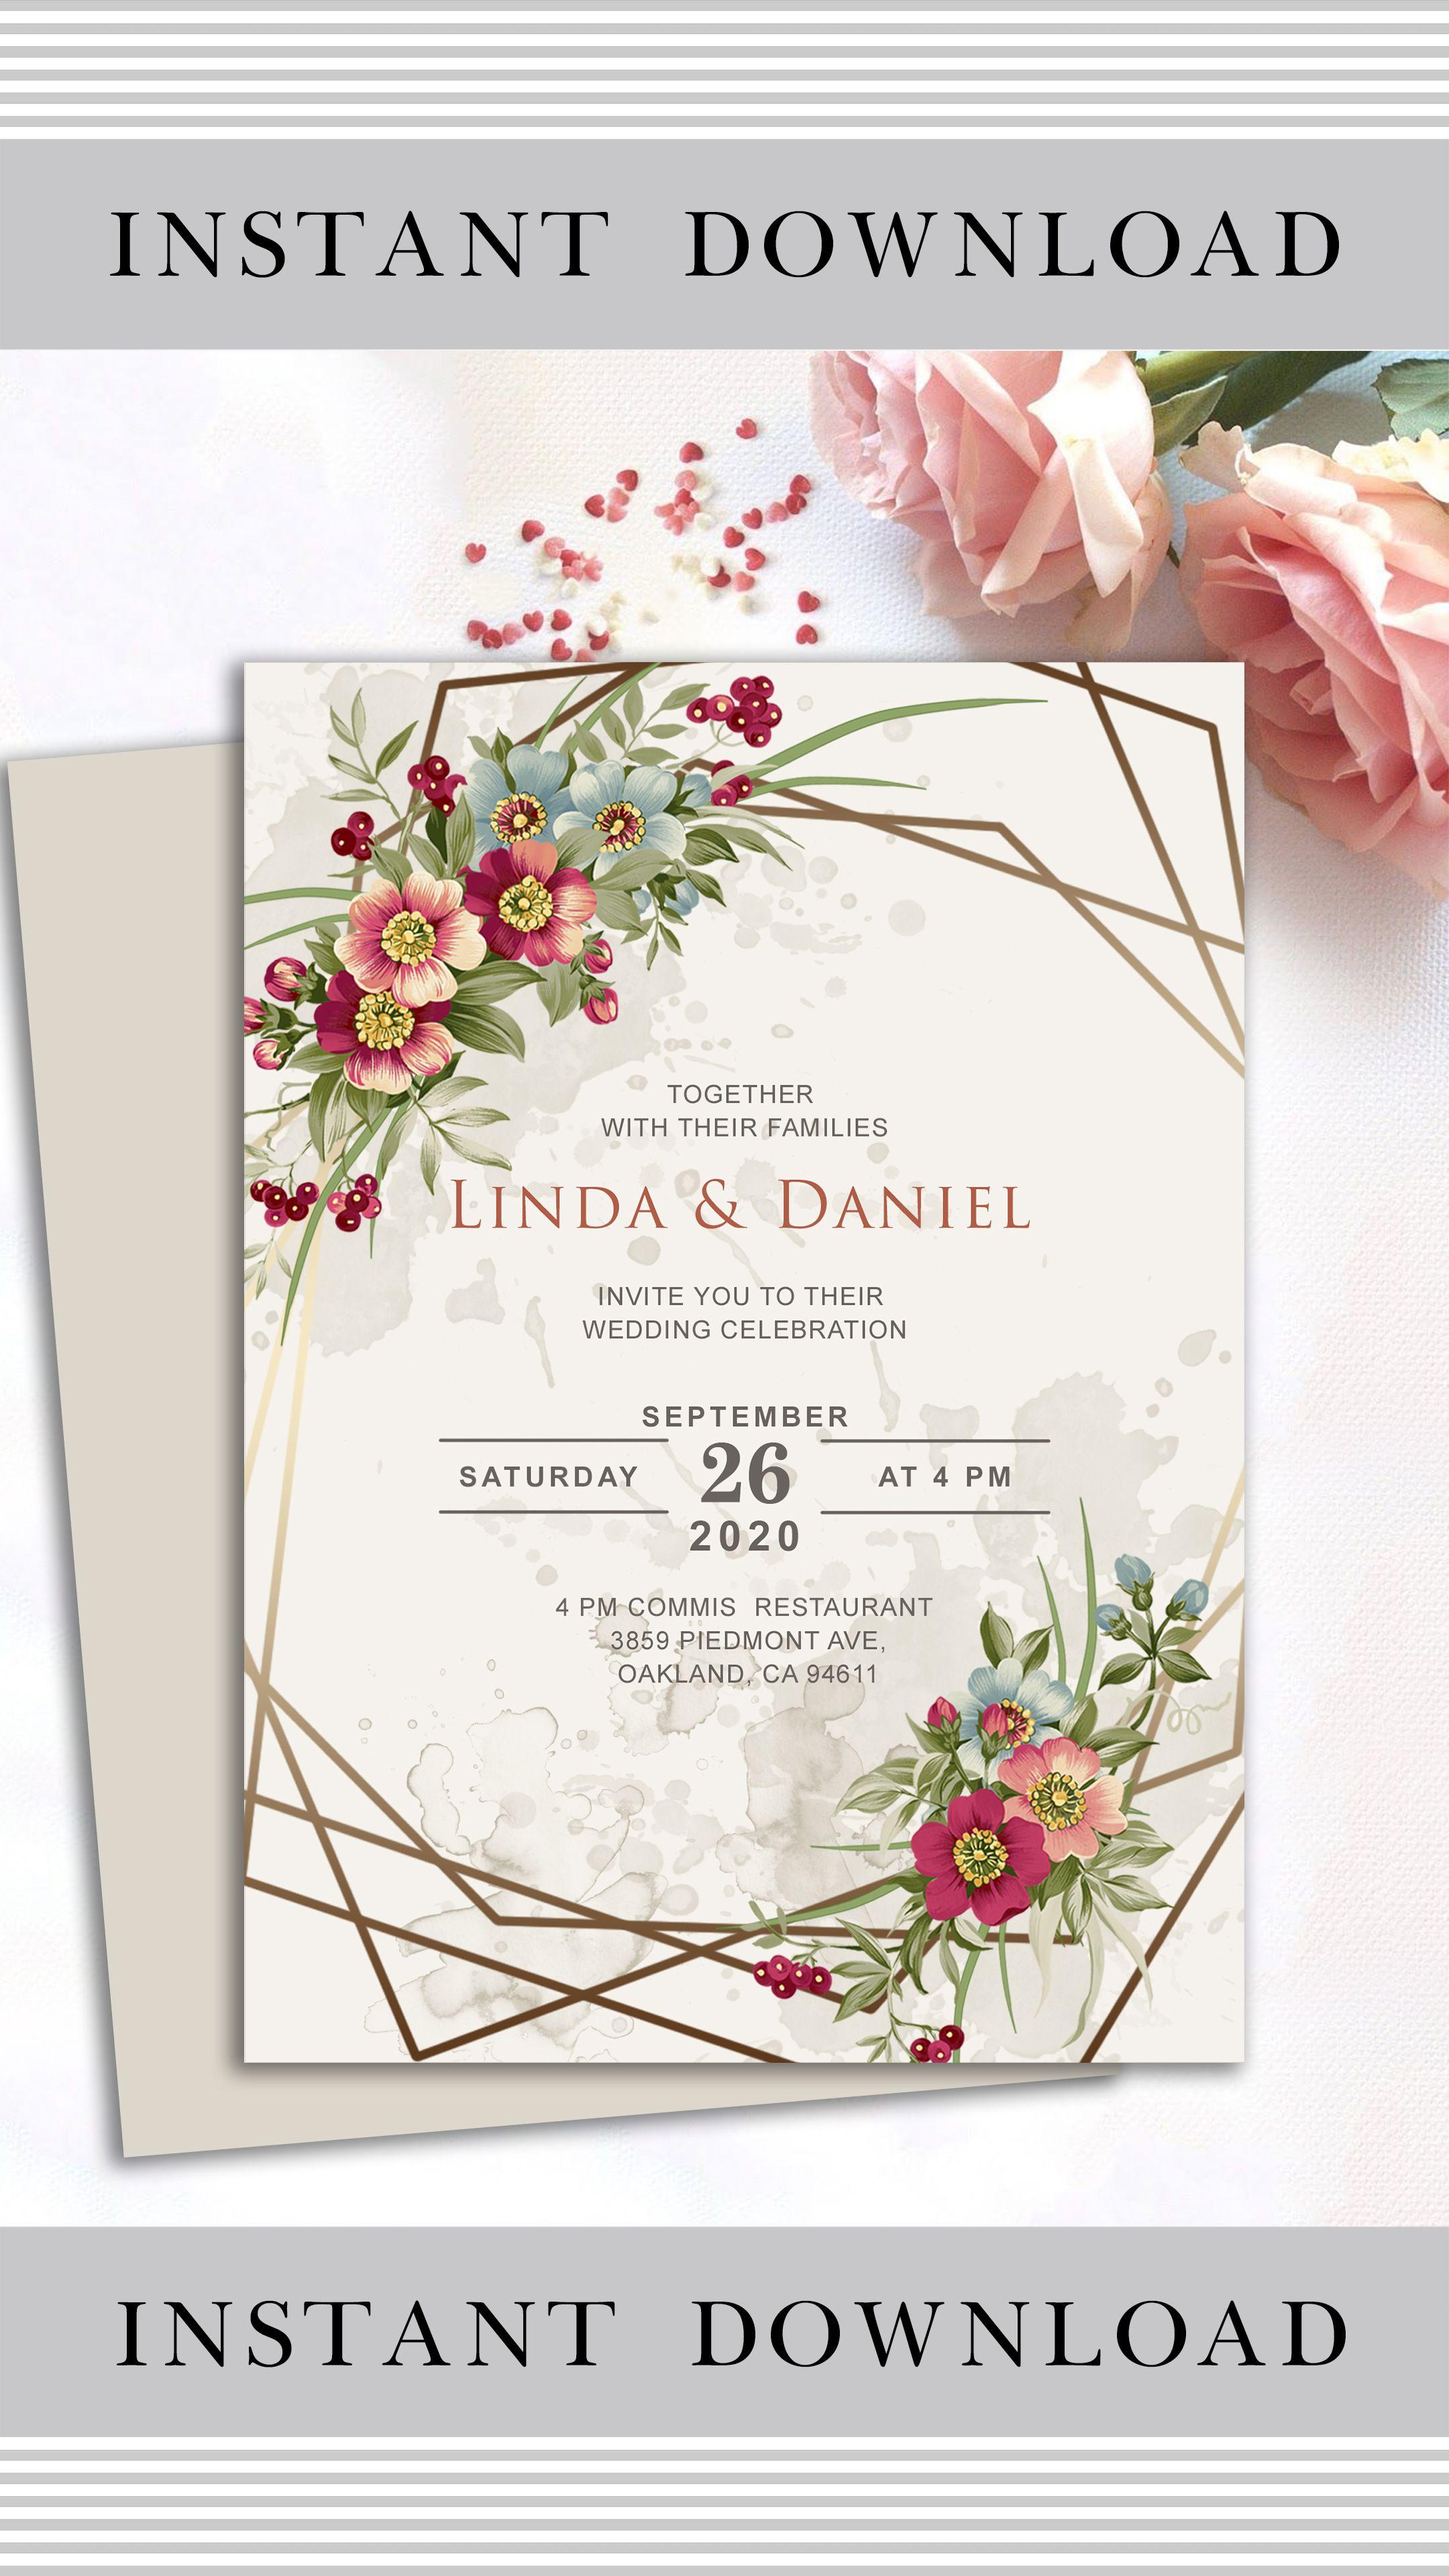 Floral Wedding Invitation Template Floral Wedding Invite Geometric Wedding Invitation Instant Download Wedding Invitation Cards Wedding Invitations Floral Wedding Invitations